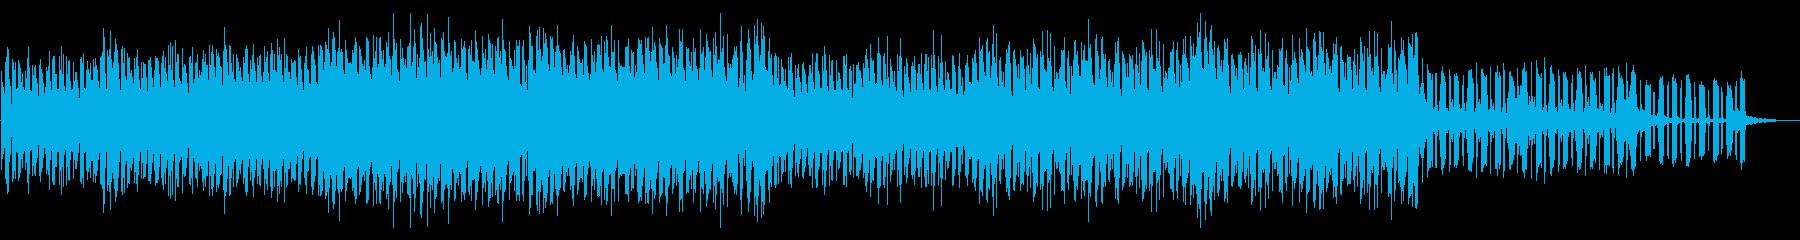 texture9の再生済みの波形